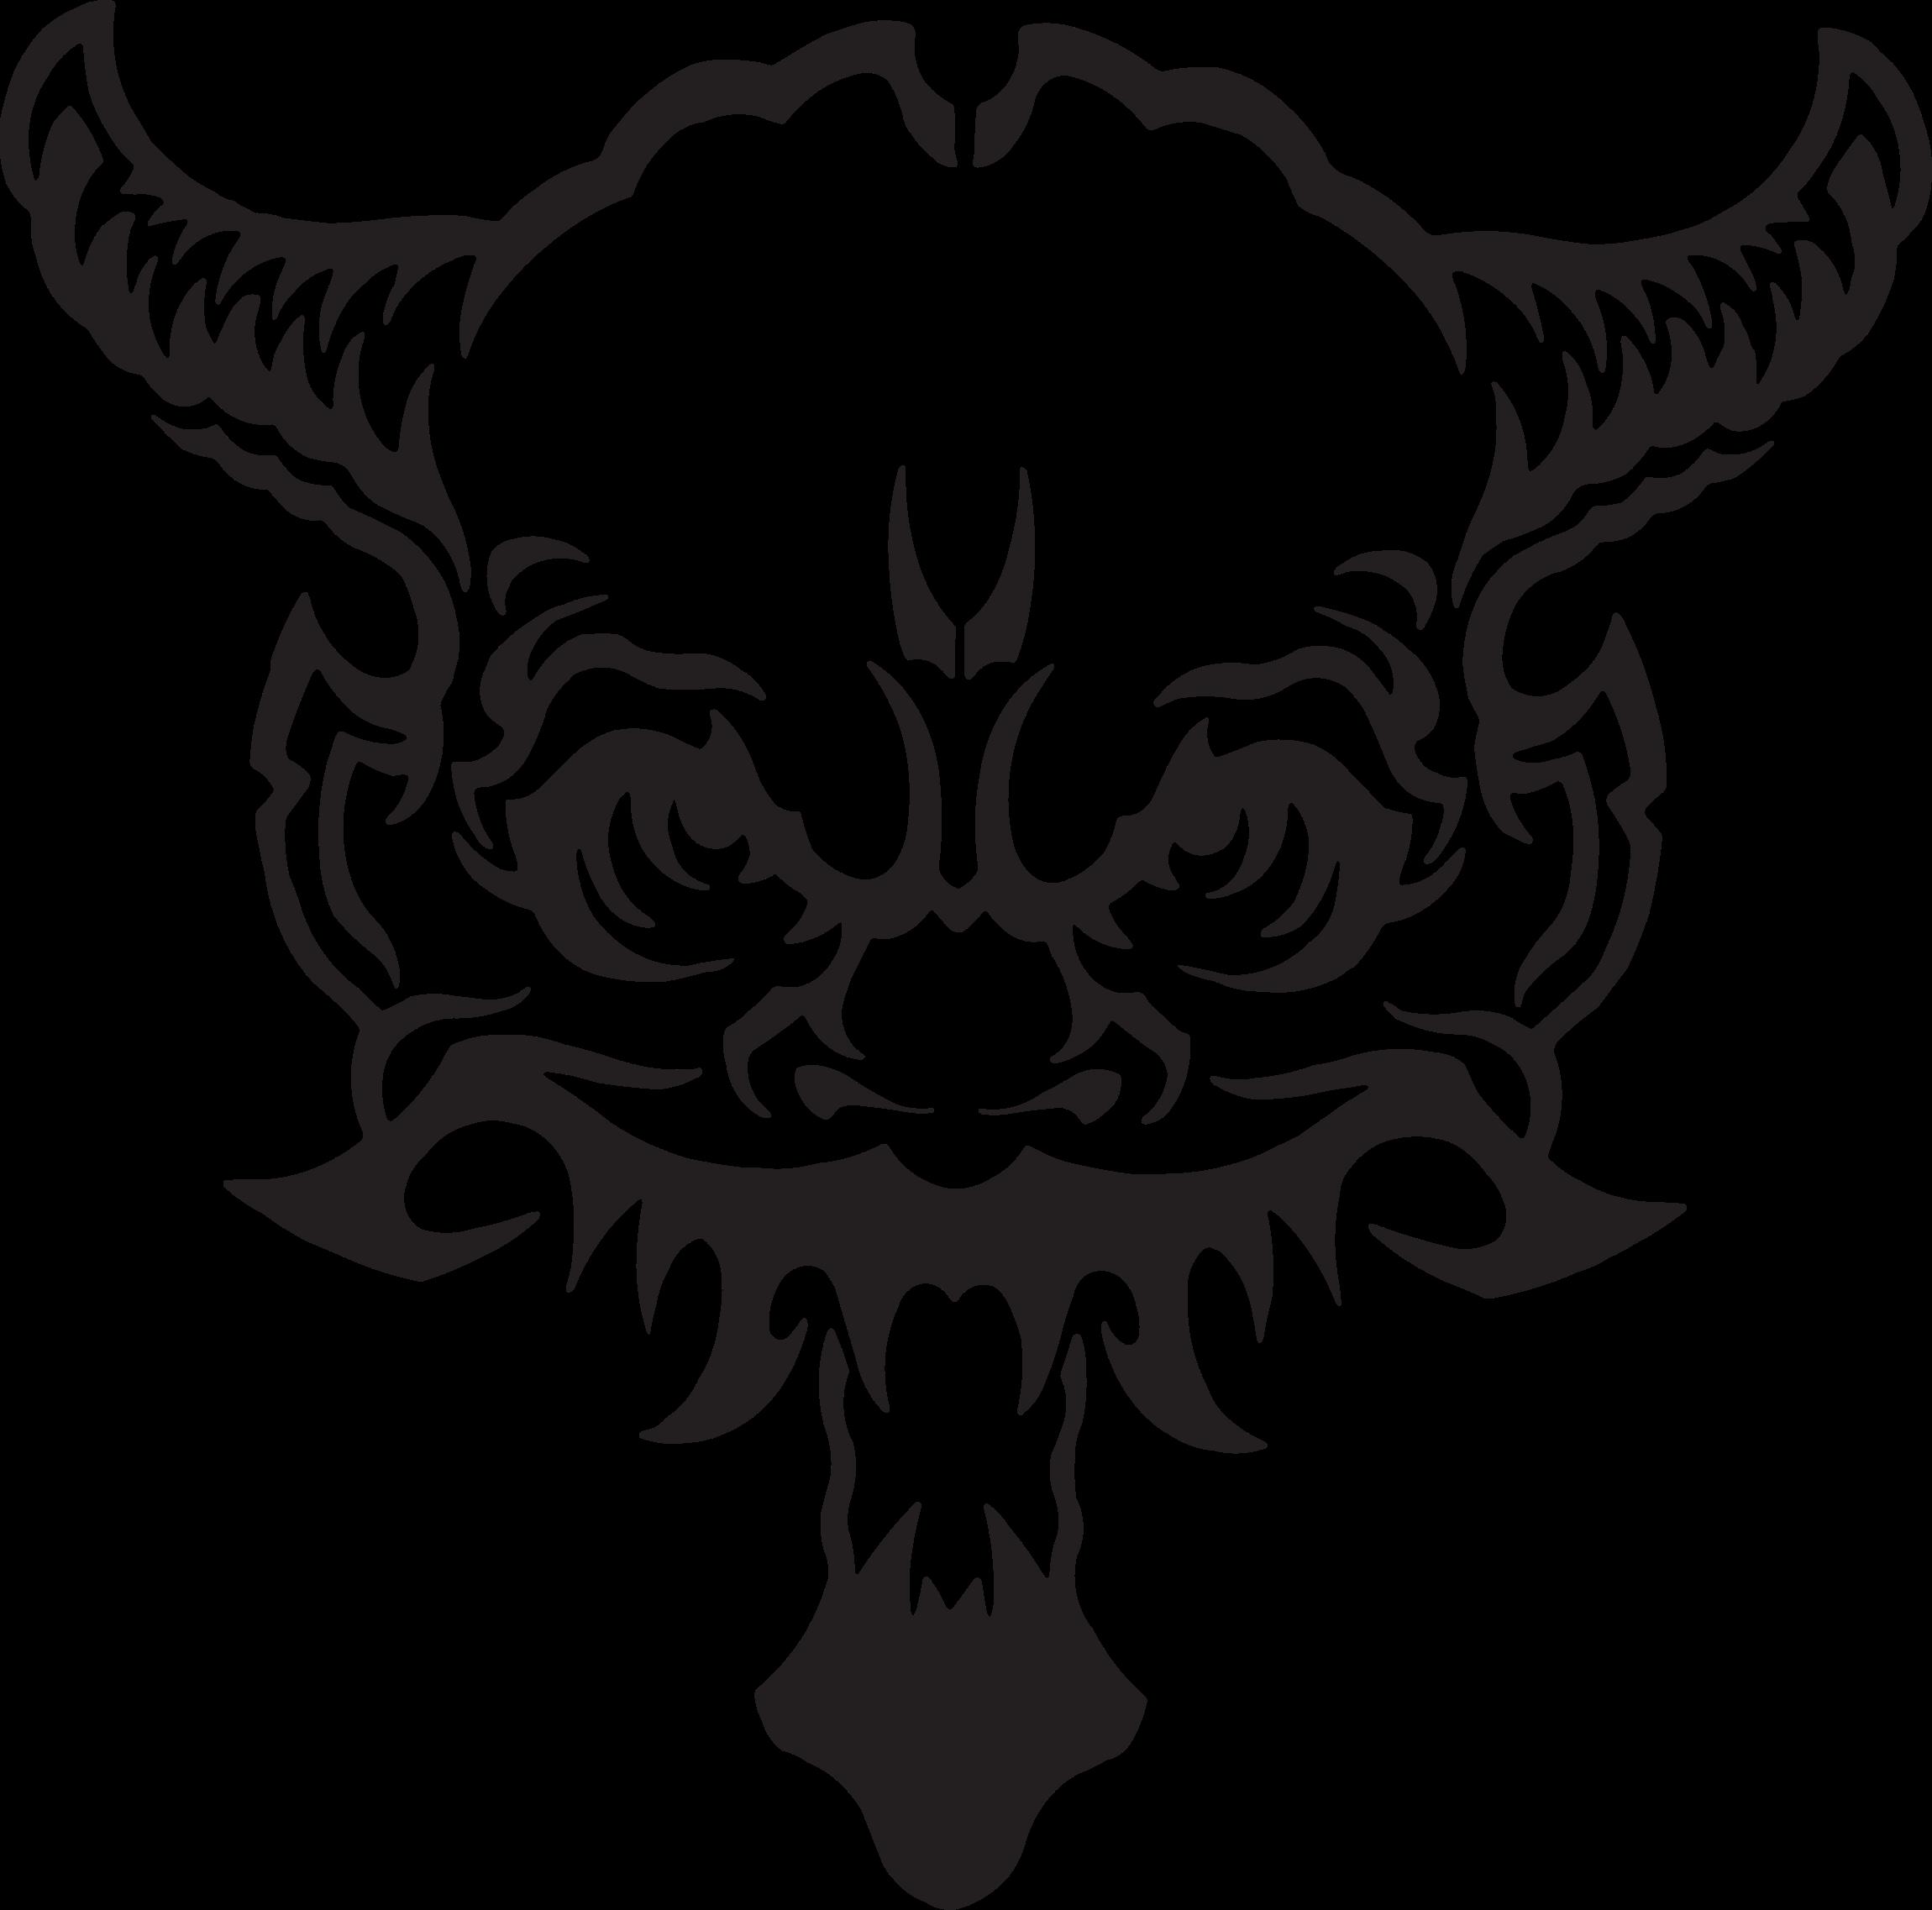 Clipart skull demonic. Demon big image png